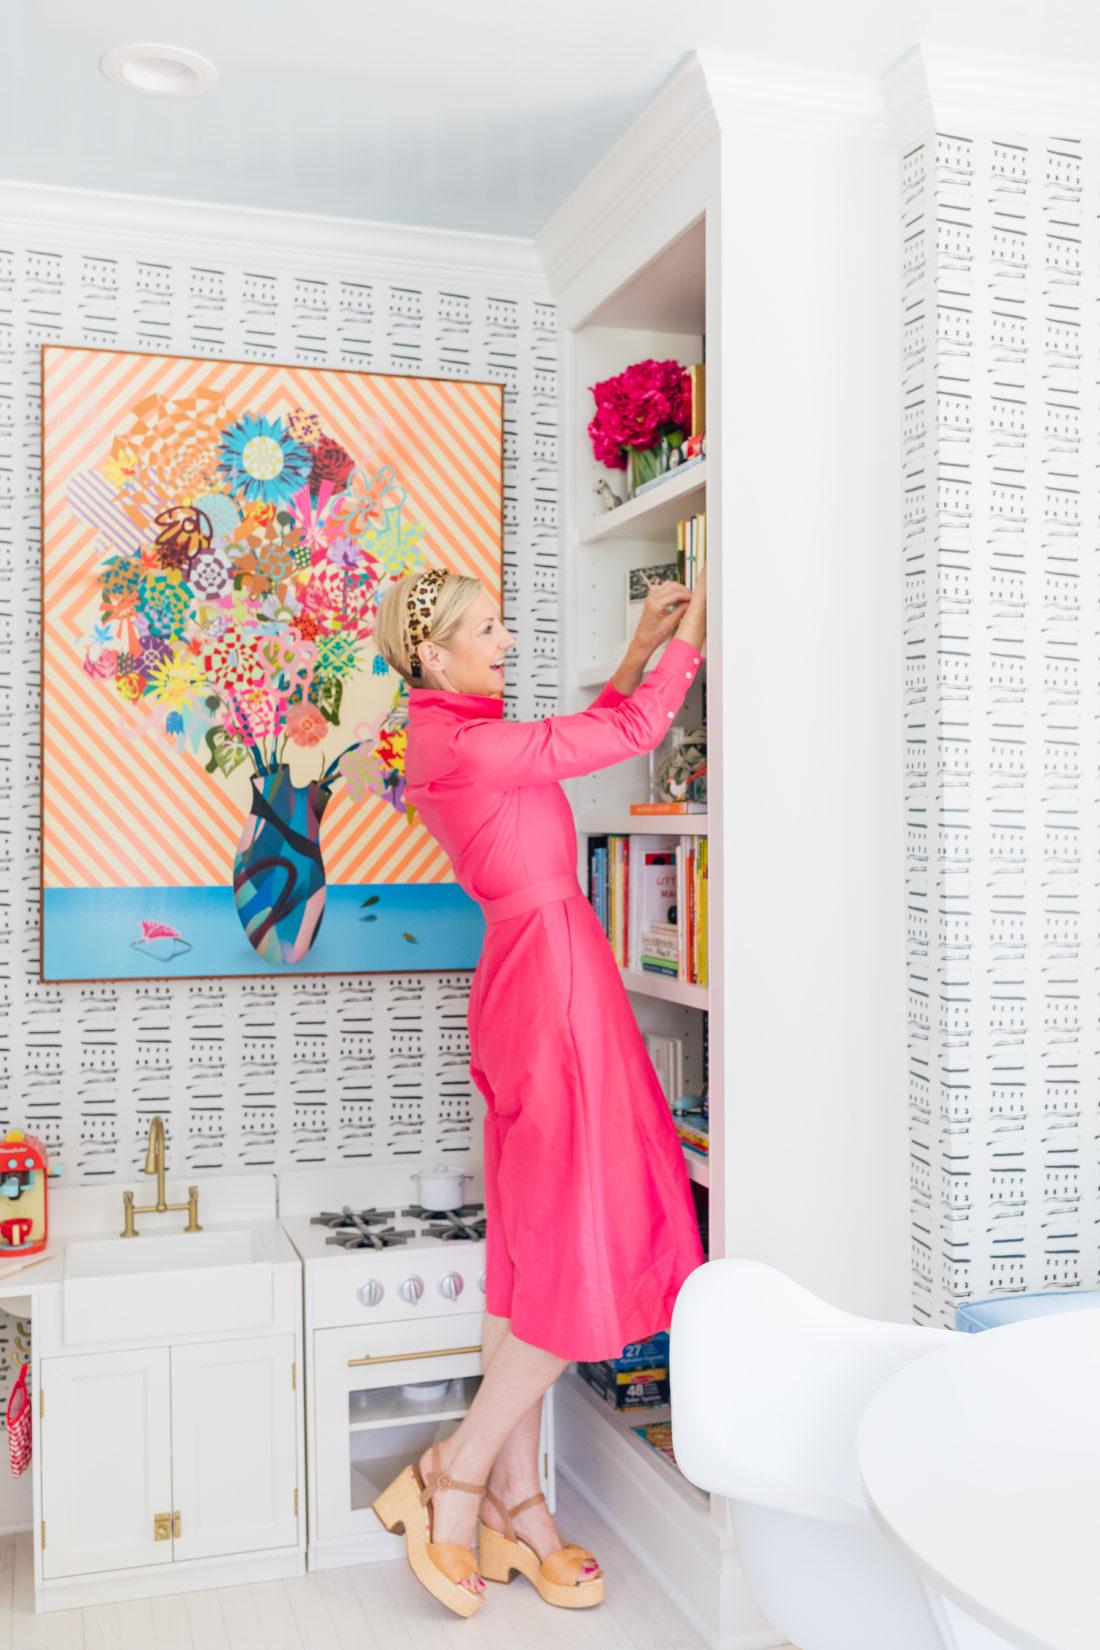 Eva Amurri Martino's interior designer Prudence Bailey from Prudence Home & Design